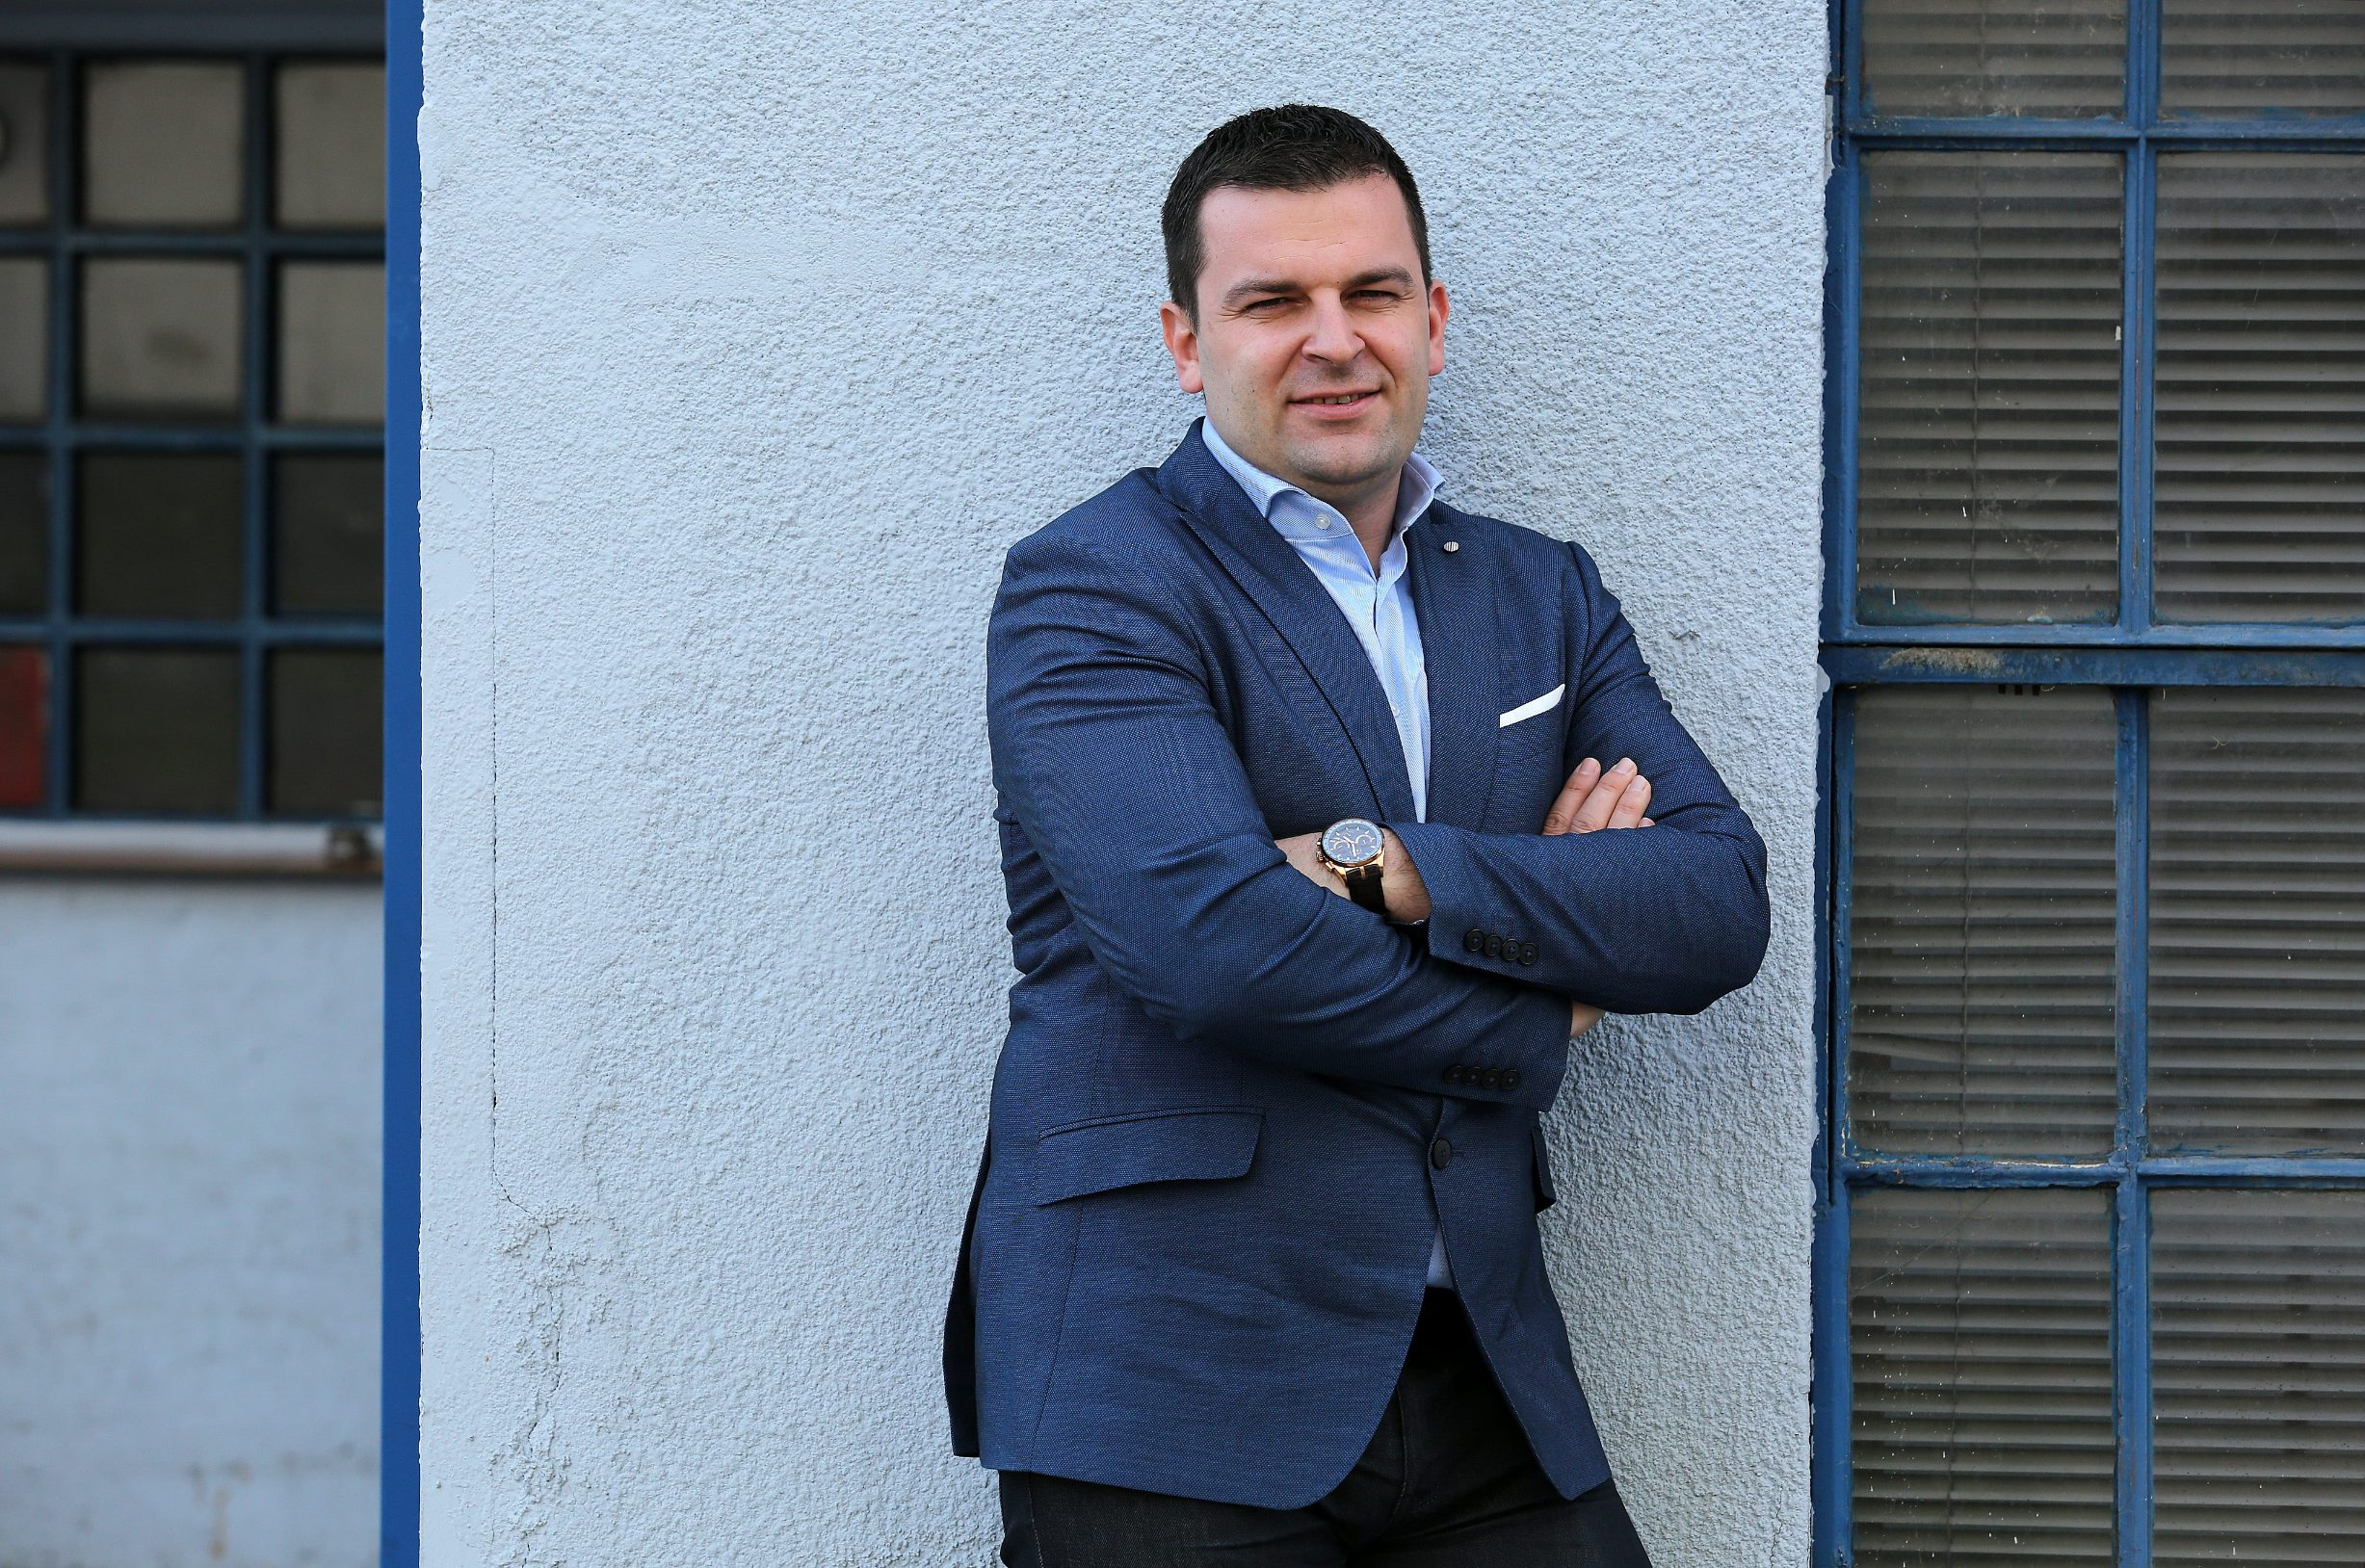 Predsjednik HSLS-a Dario Hrebak